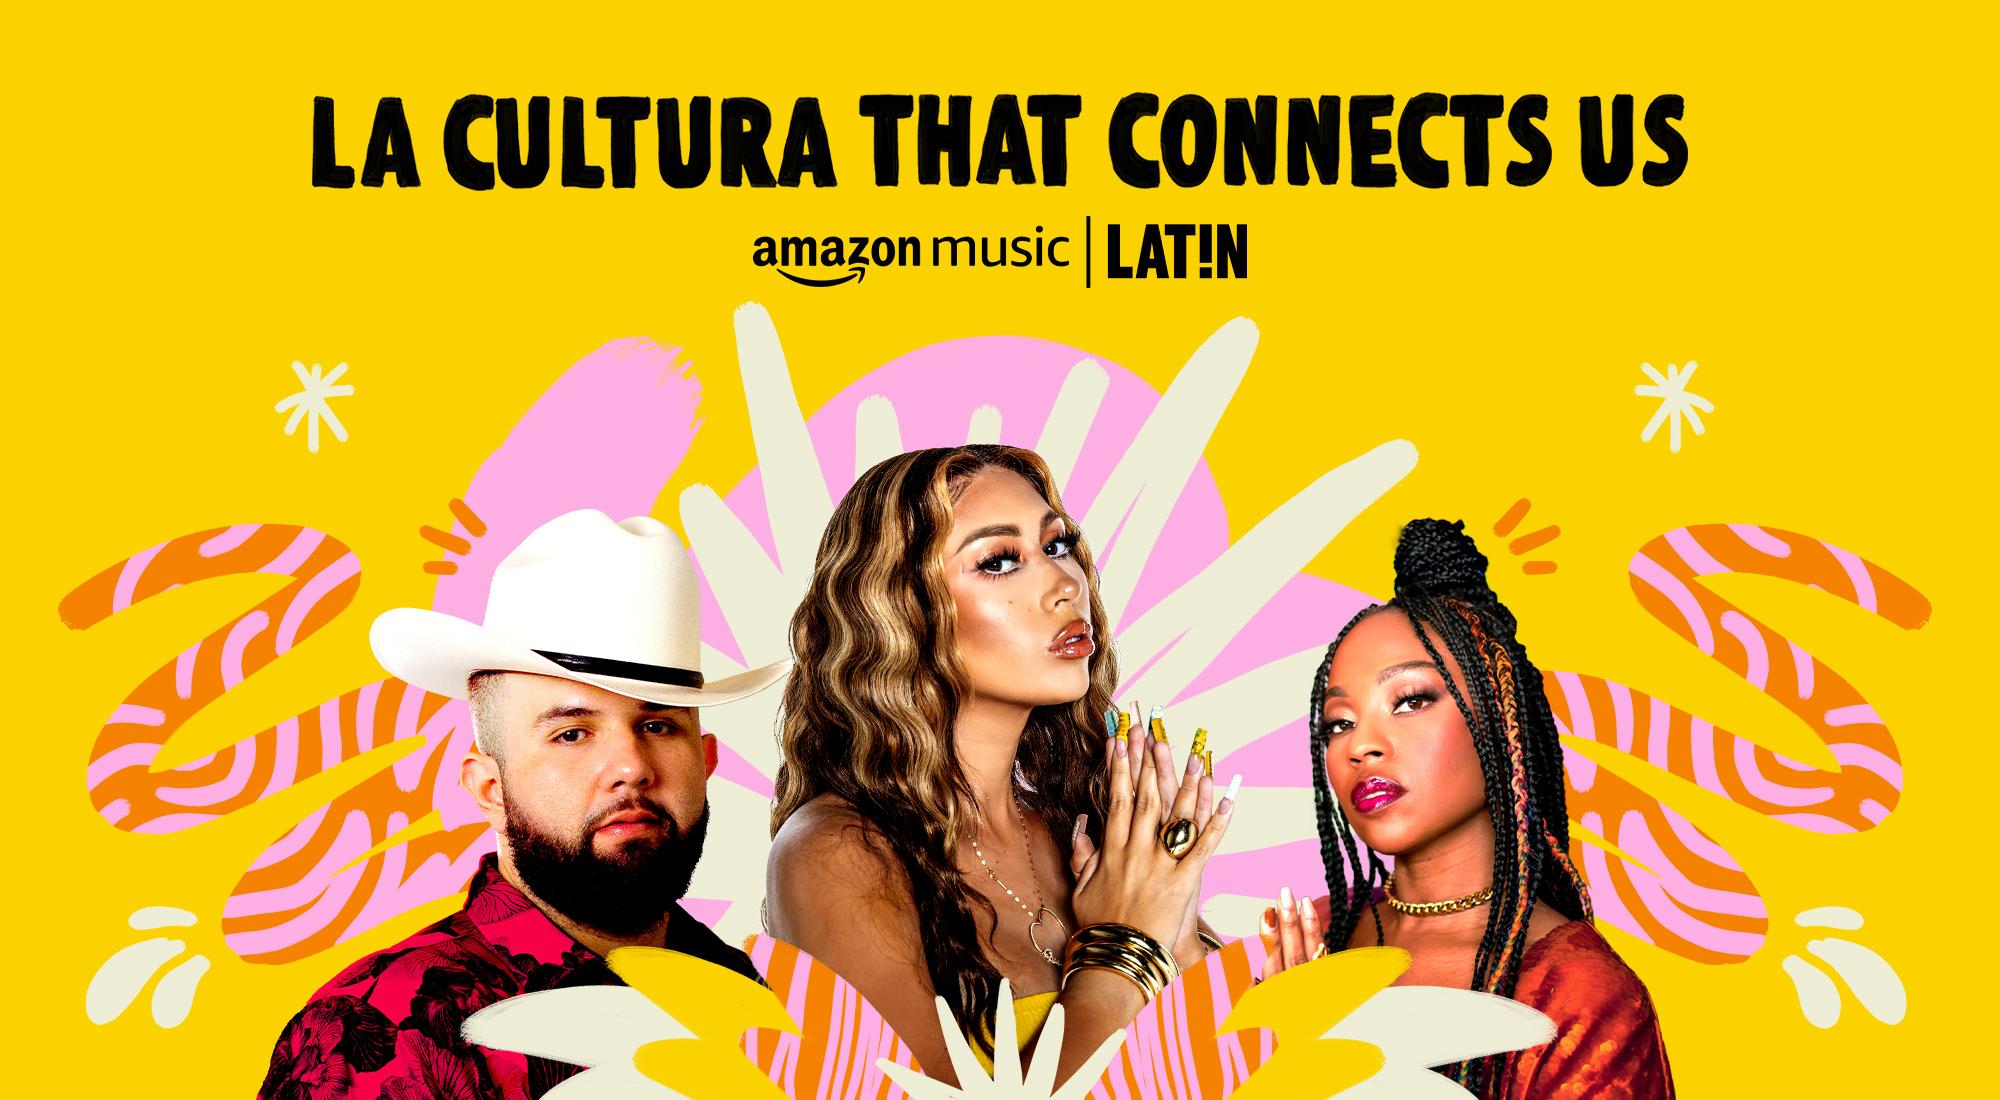 La Cultura that Connects Us amazon